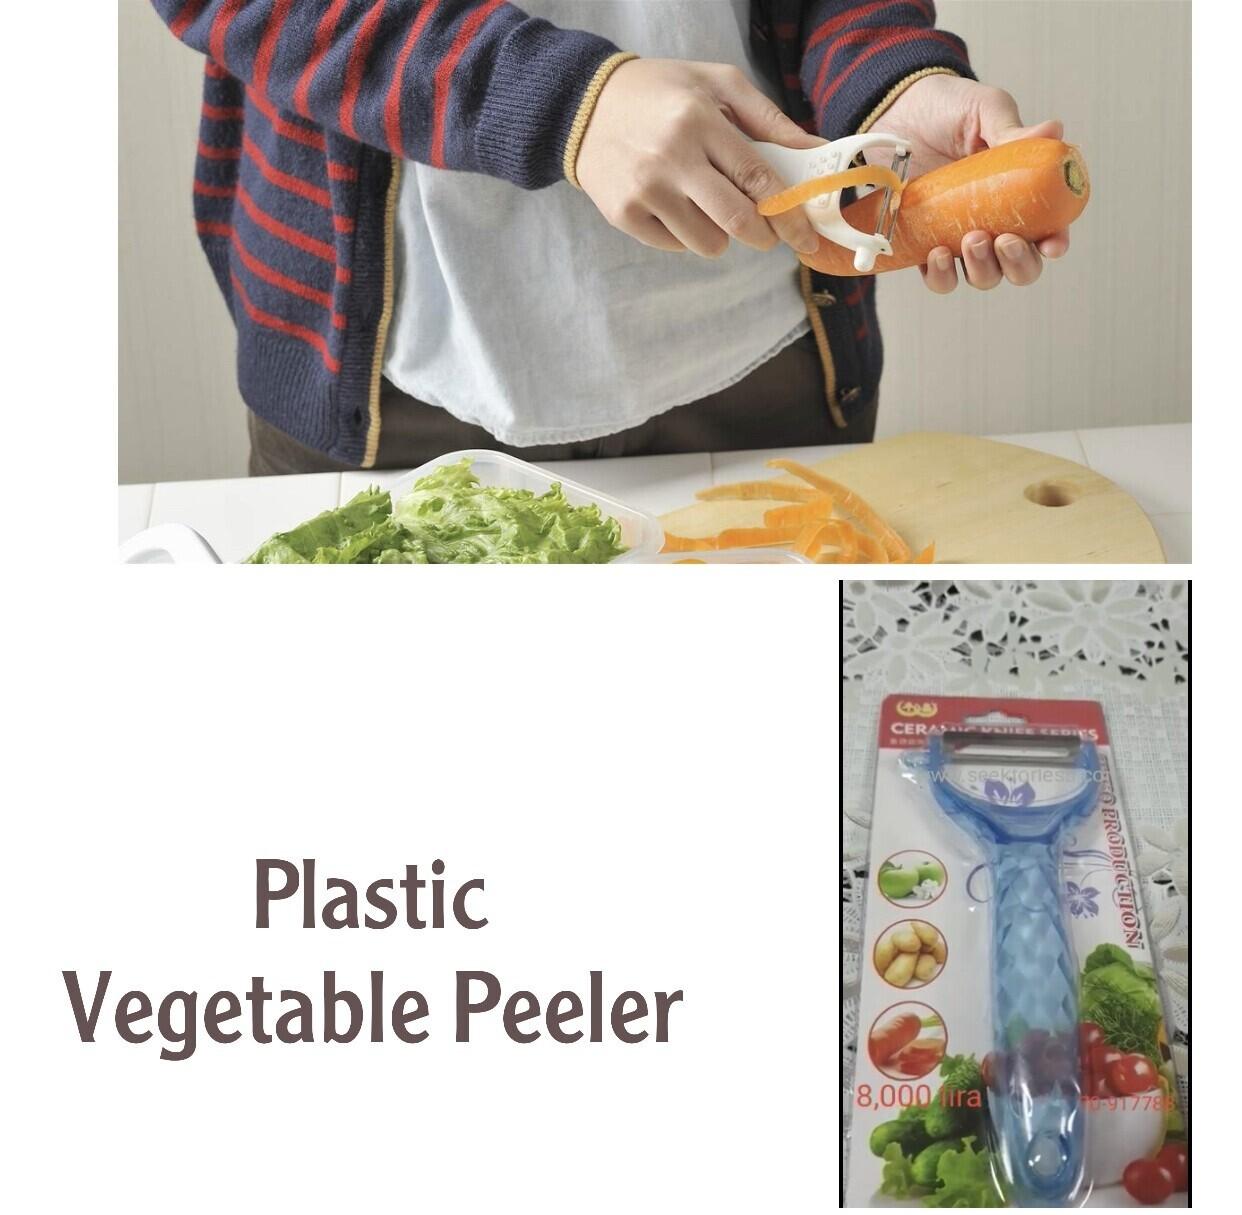 Plastic Peeler